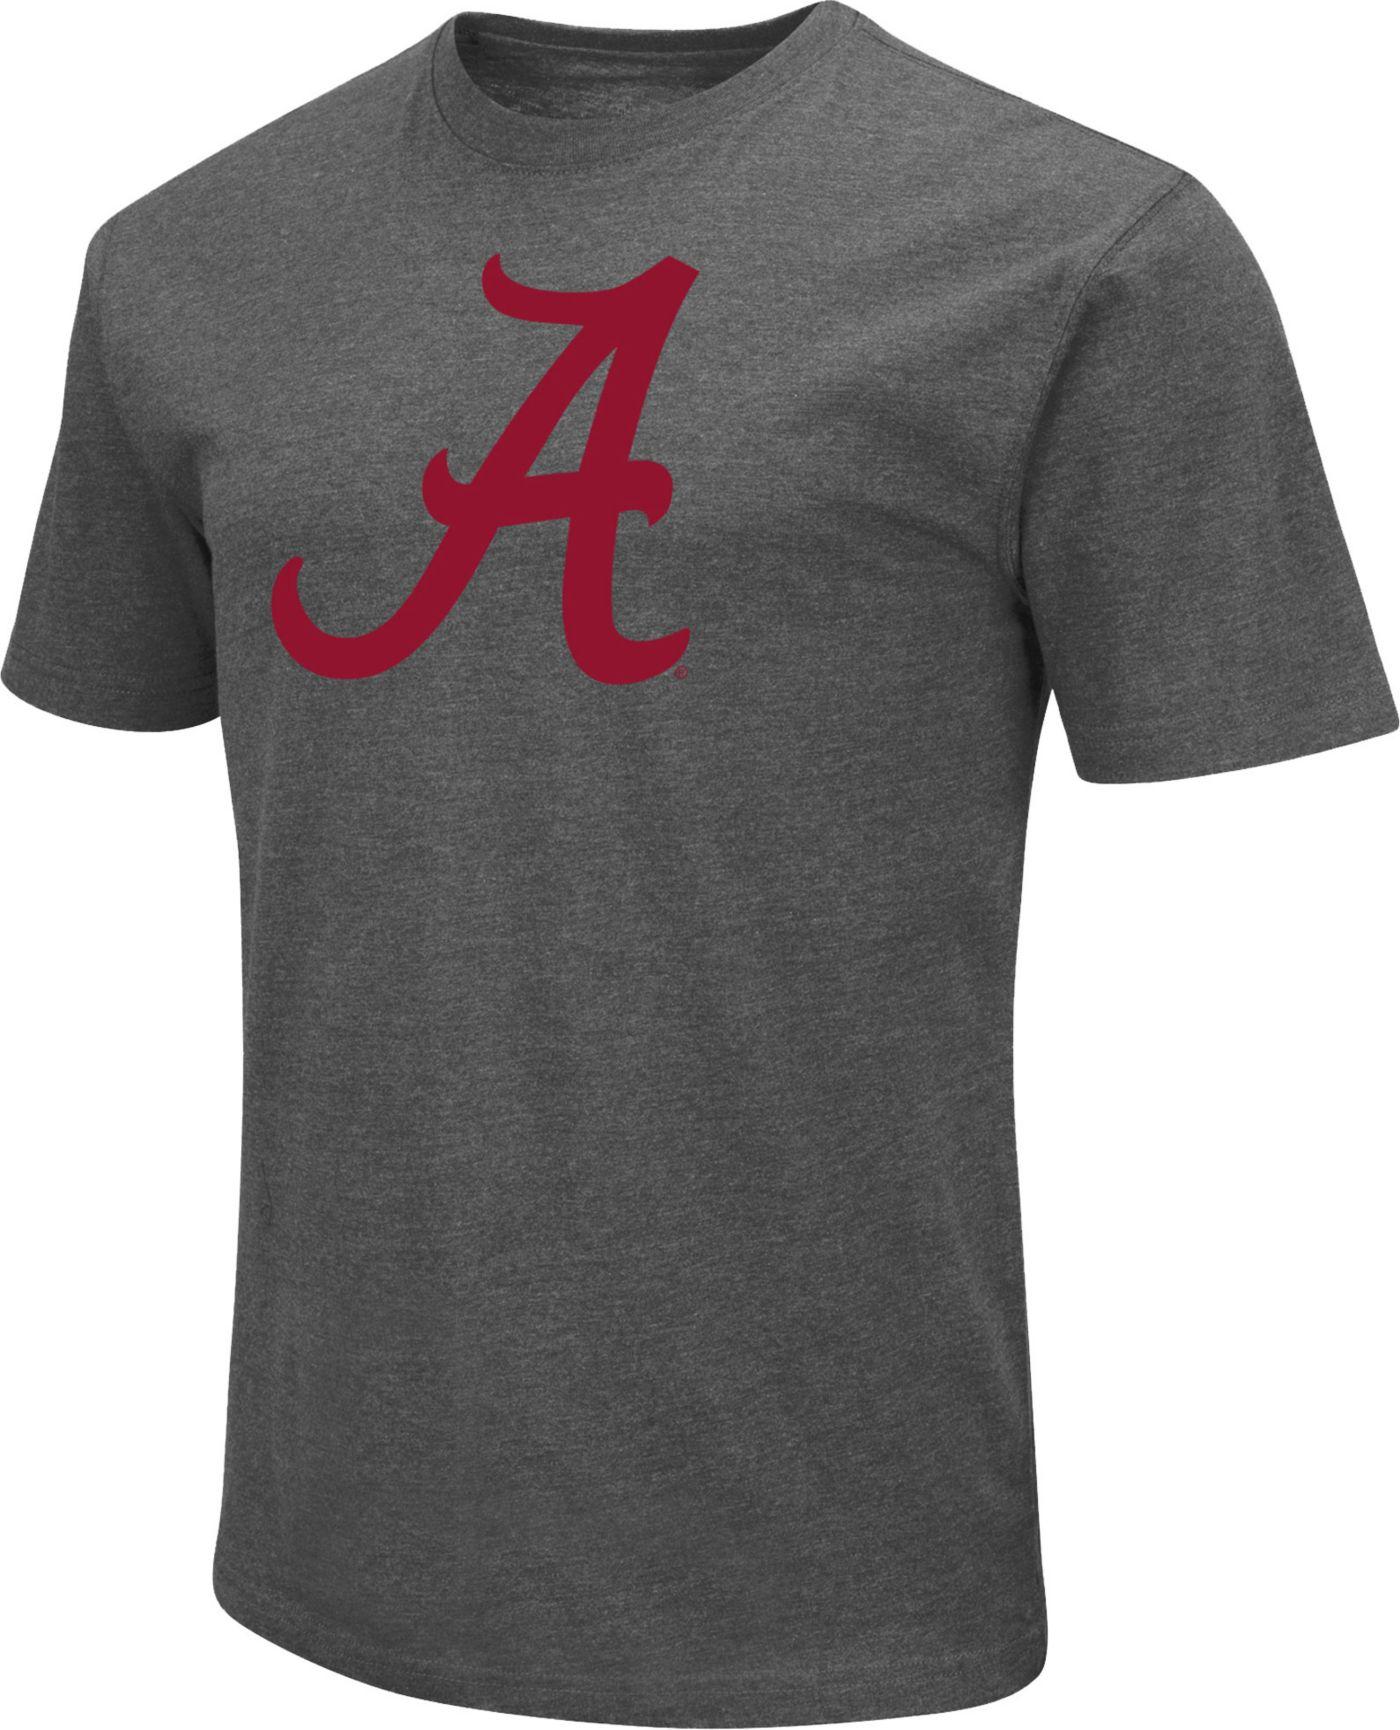 Colosseum Men's Alabama Crimson Tide Grey Dual Blend T-Shirt